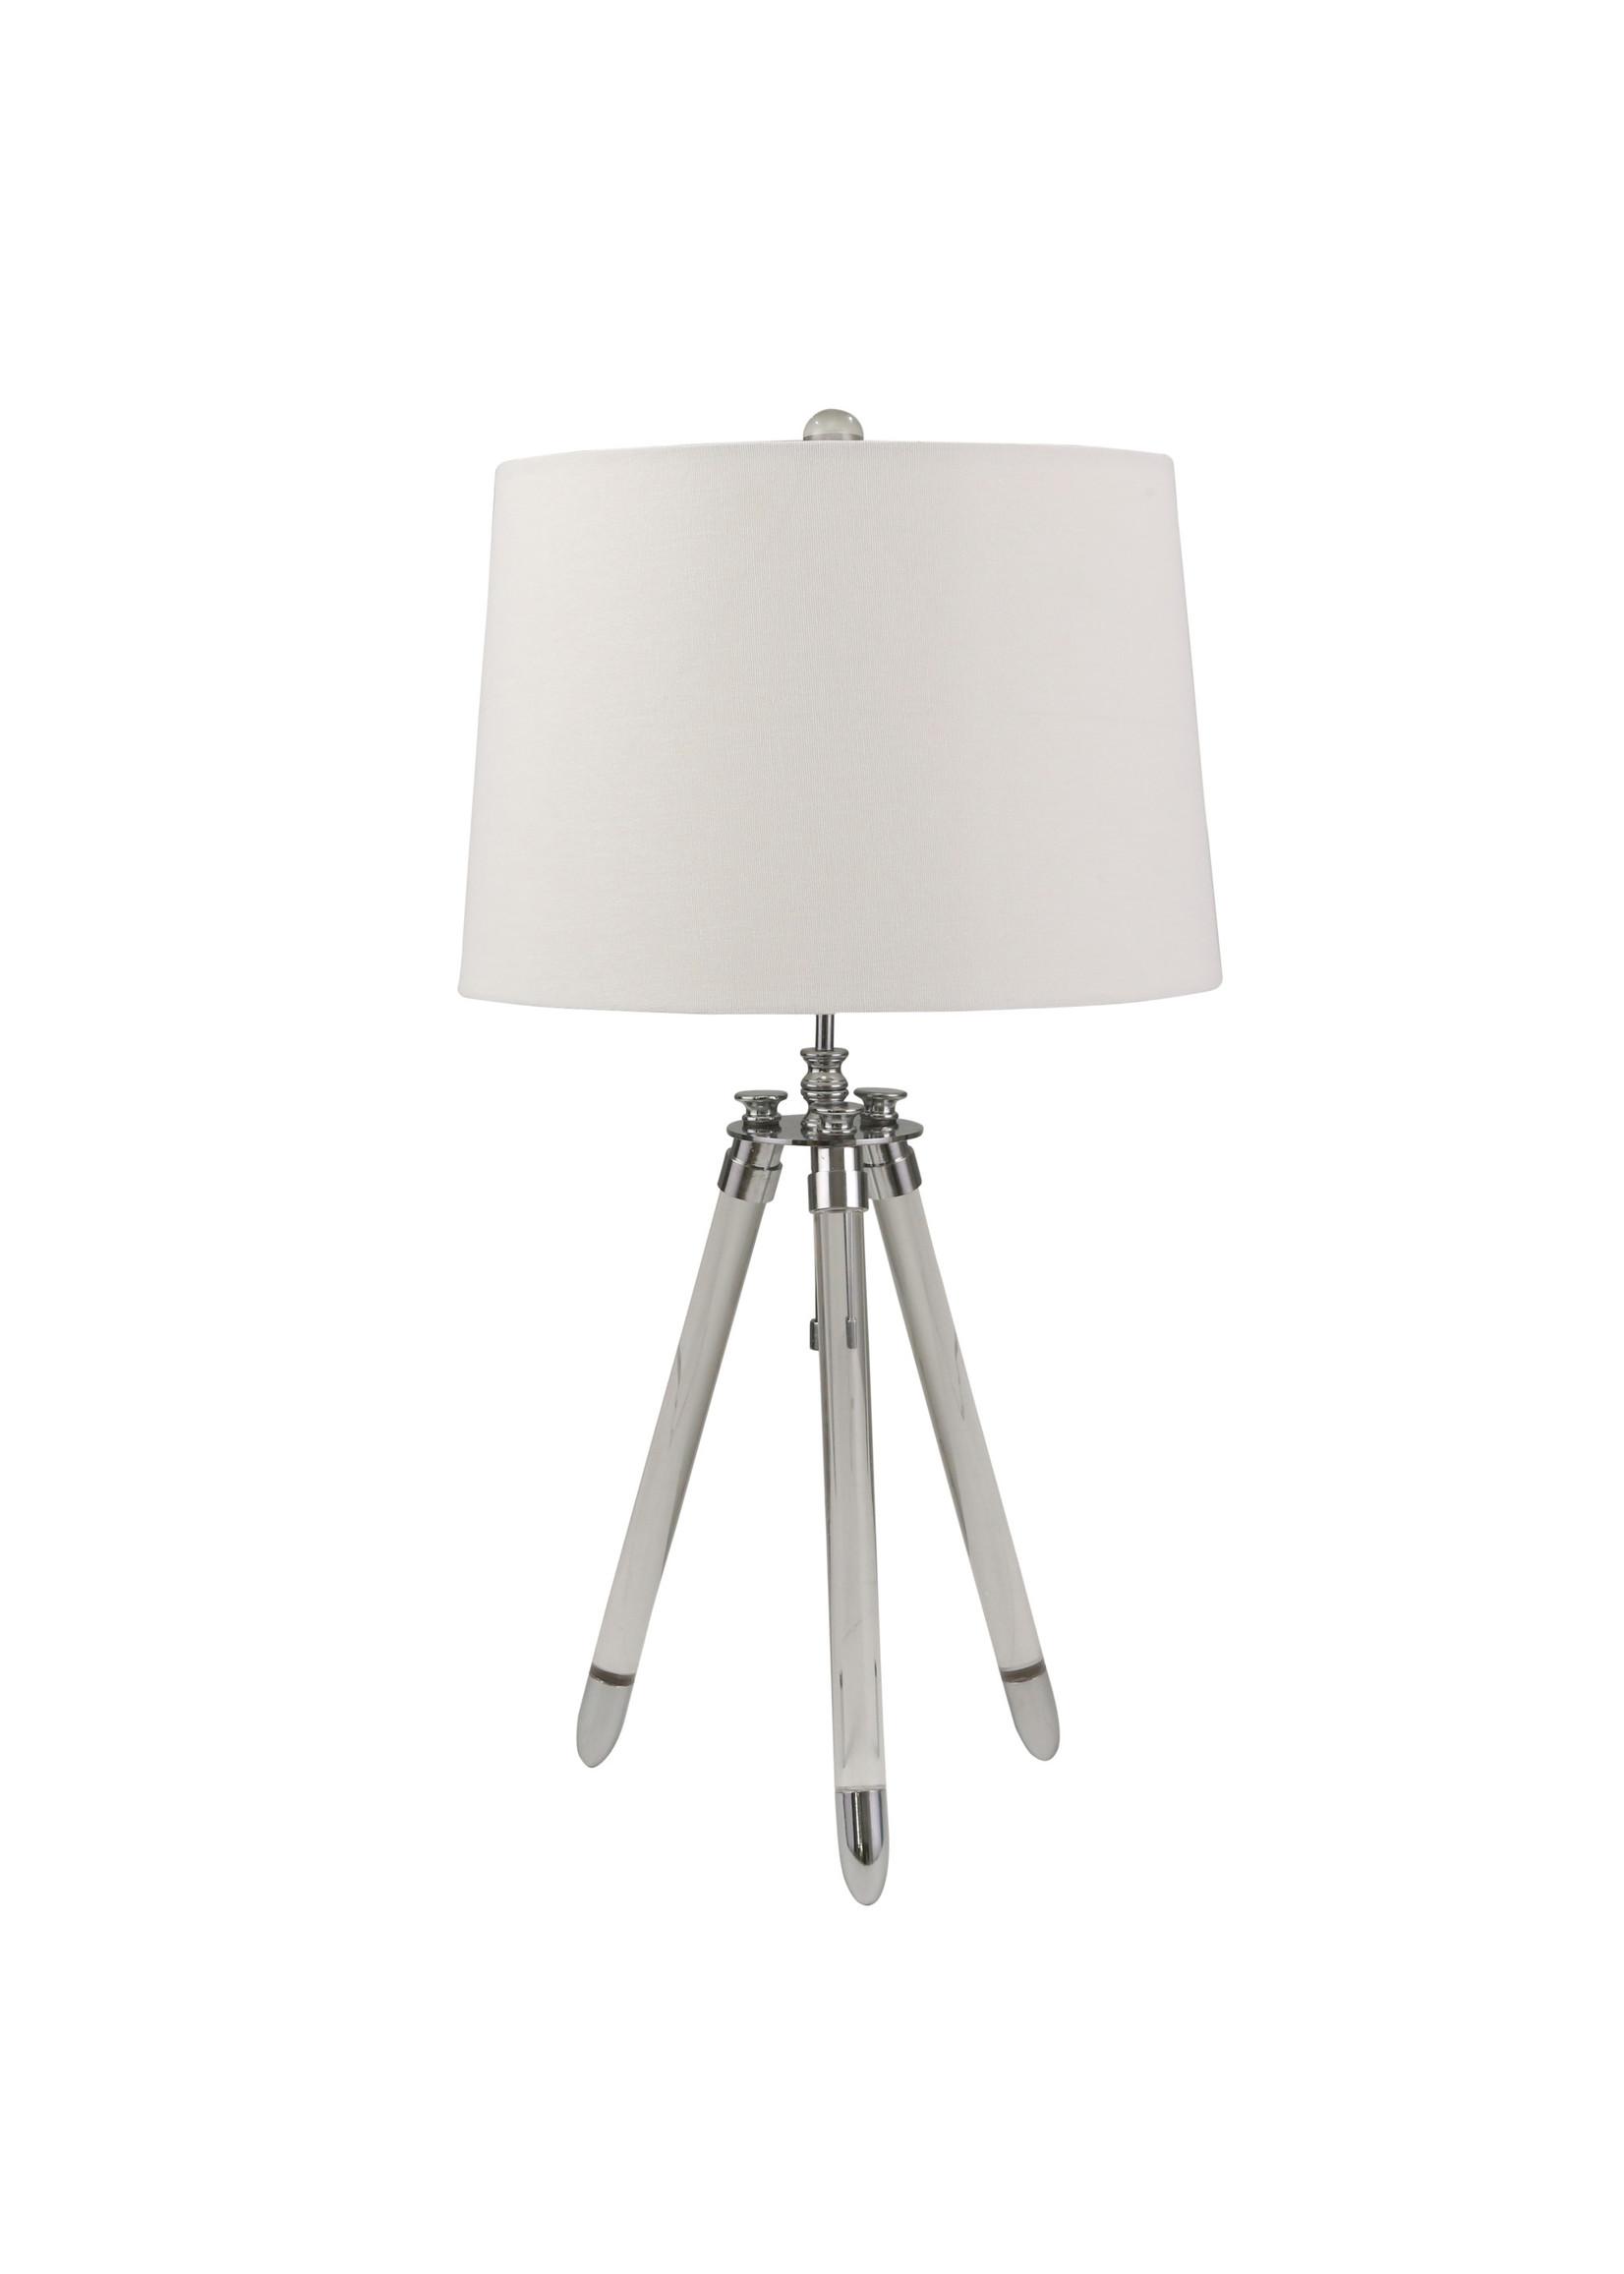 "Sagebrook Home SBH Acrylic 29"" Tripod Table Lamp Silver"